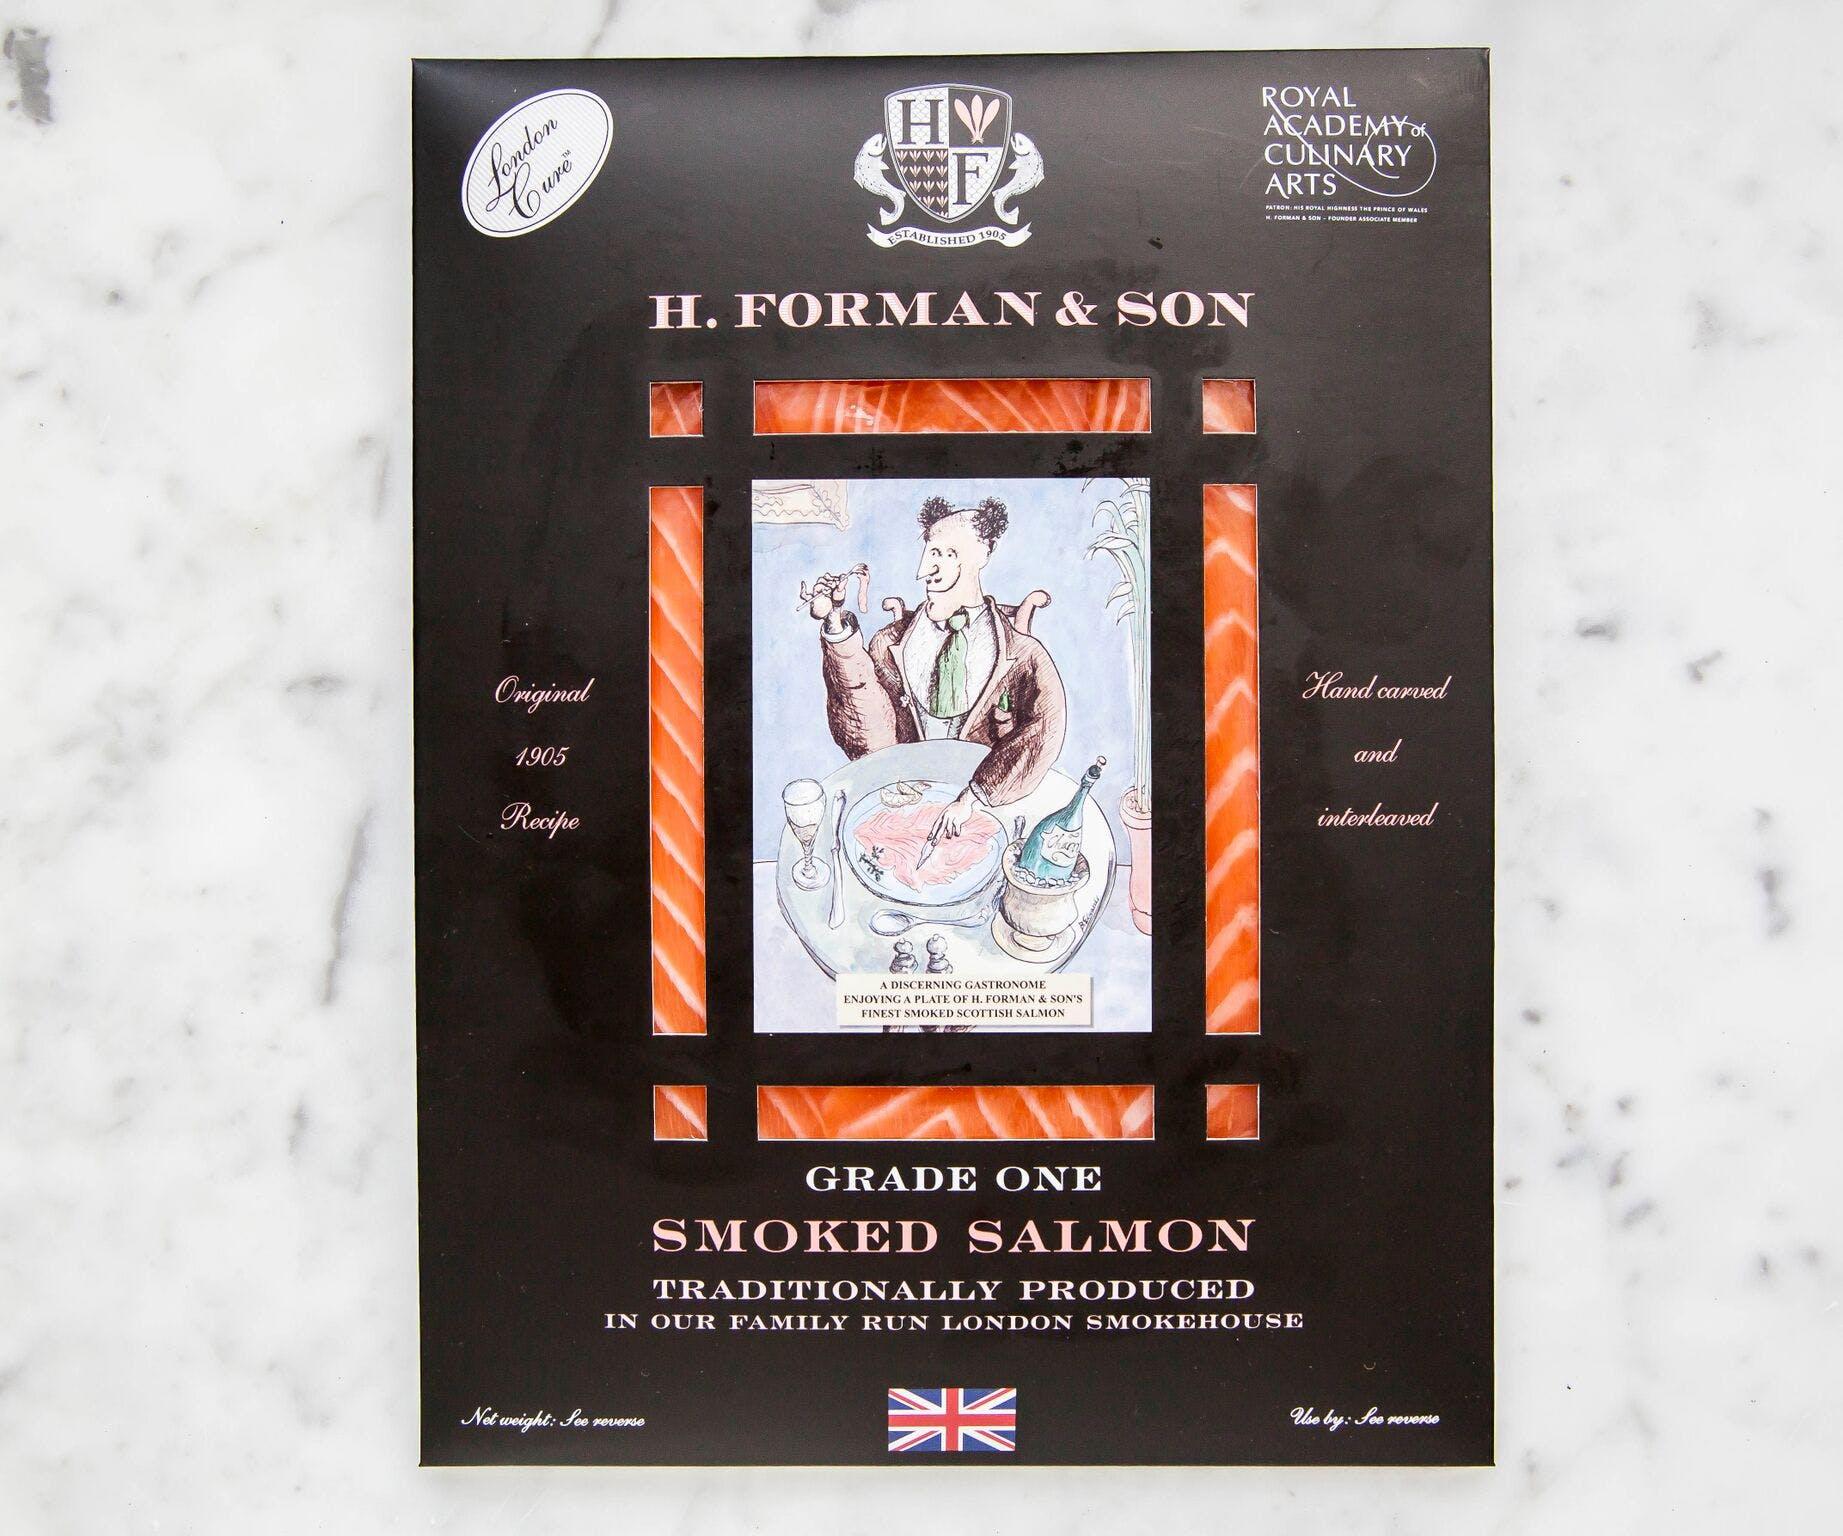 London Cure Smoked Salmon (Sliced)